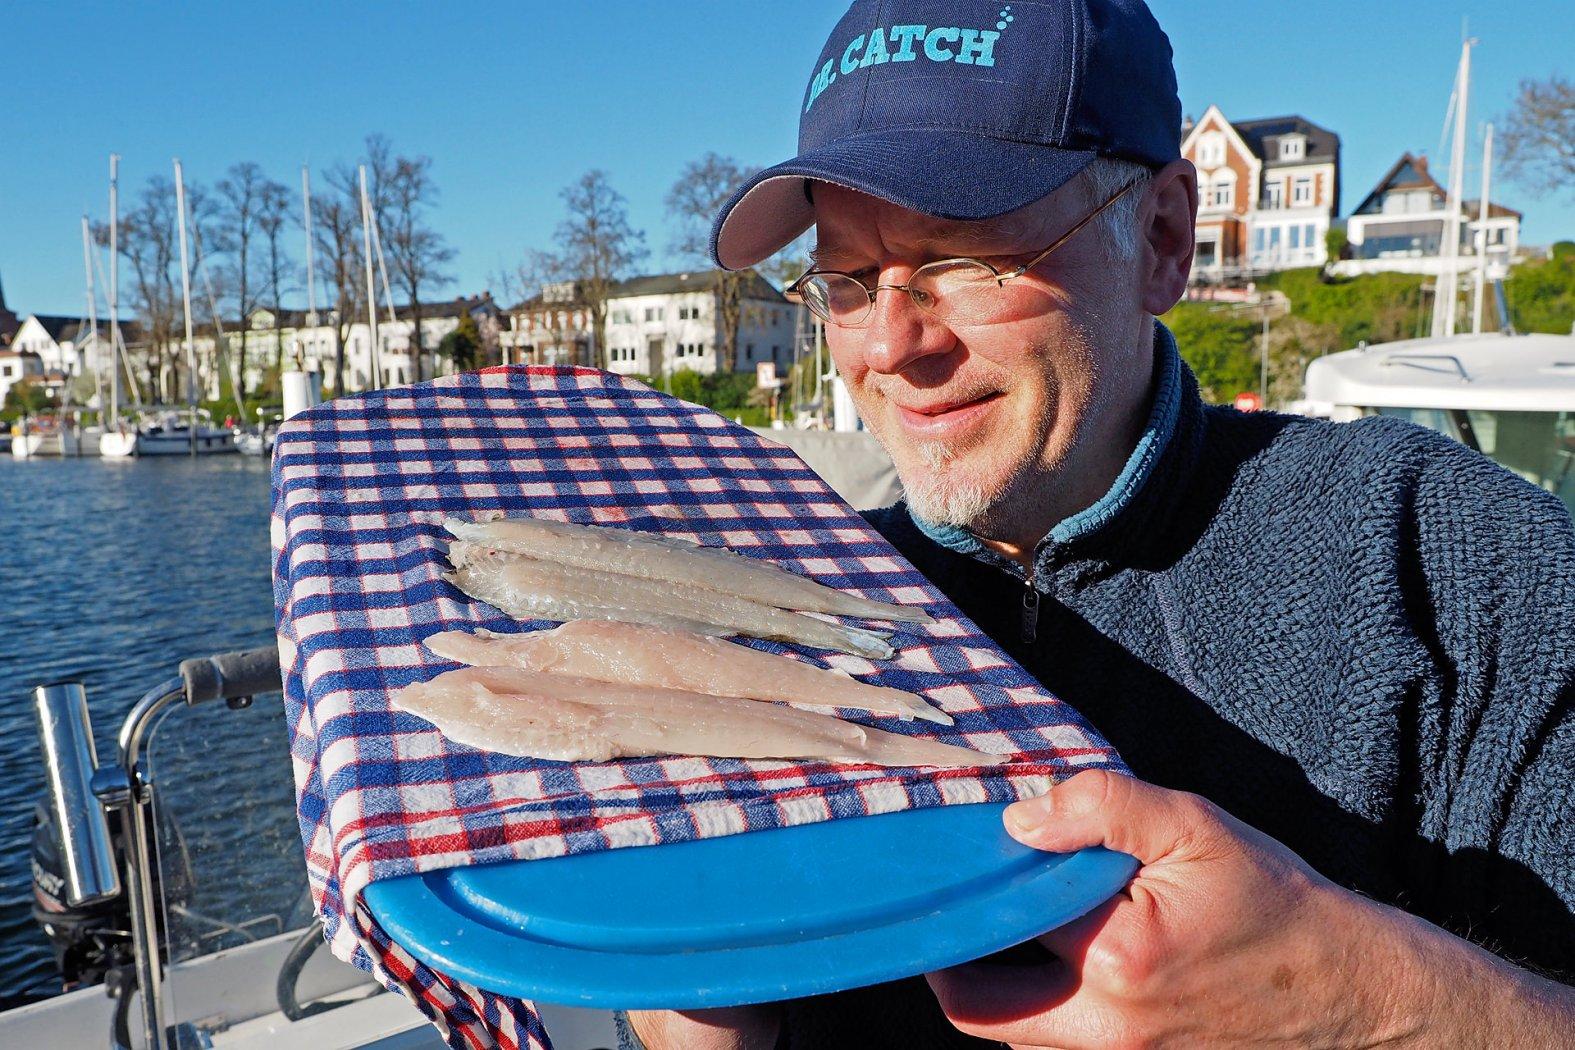 plattfisch sauber filetiert